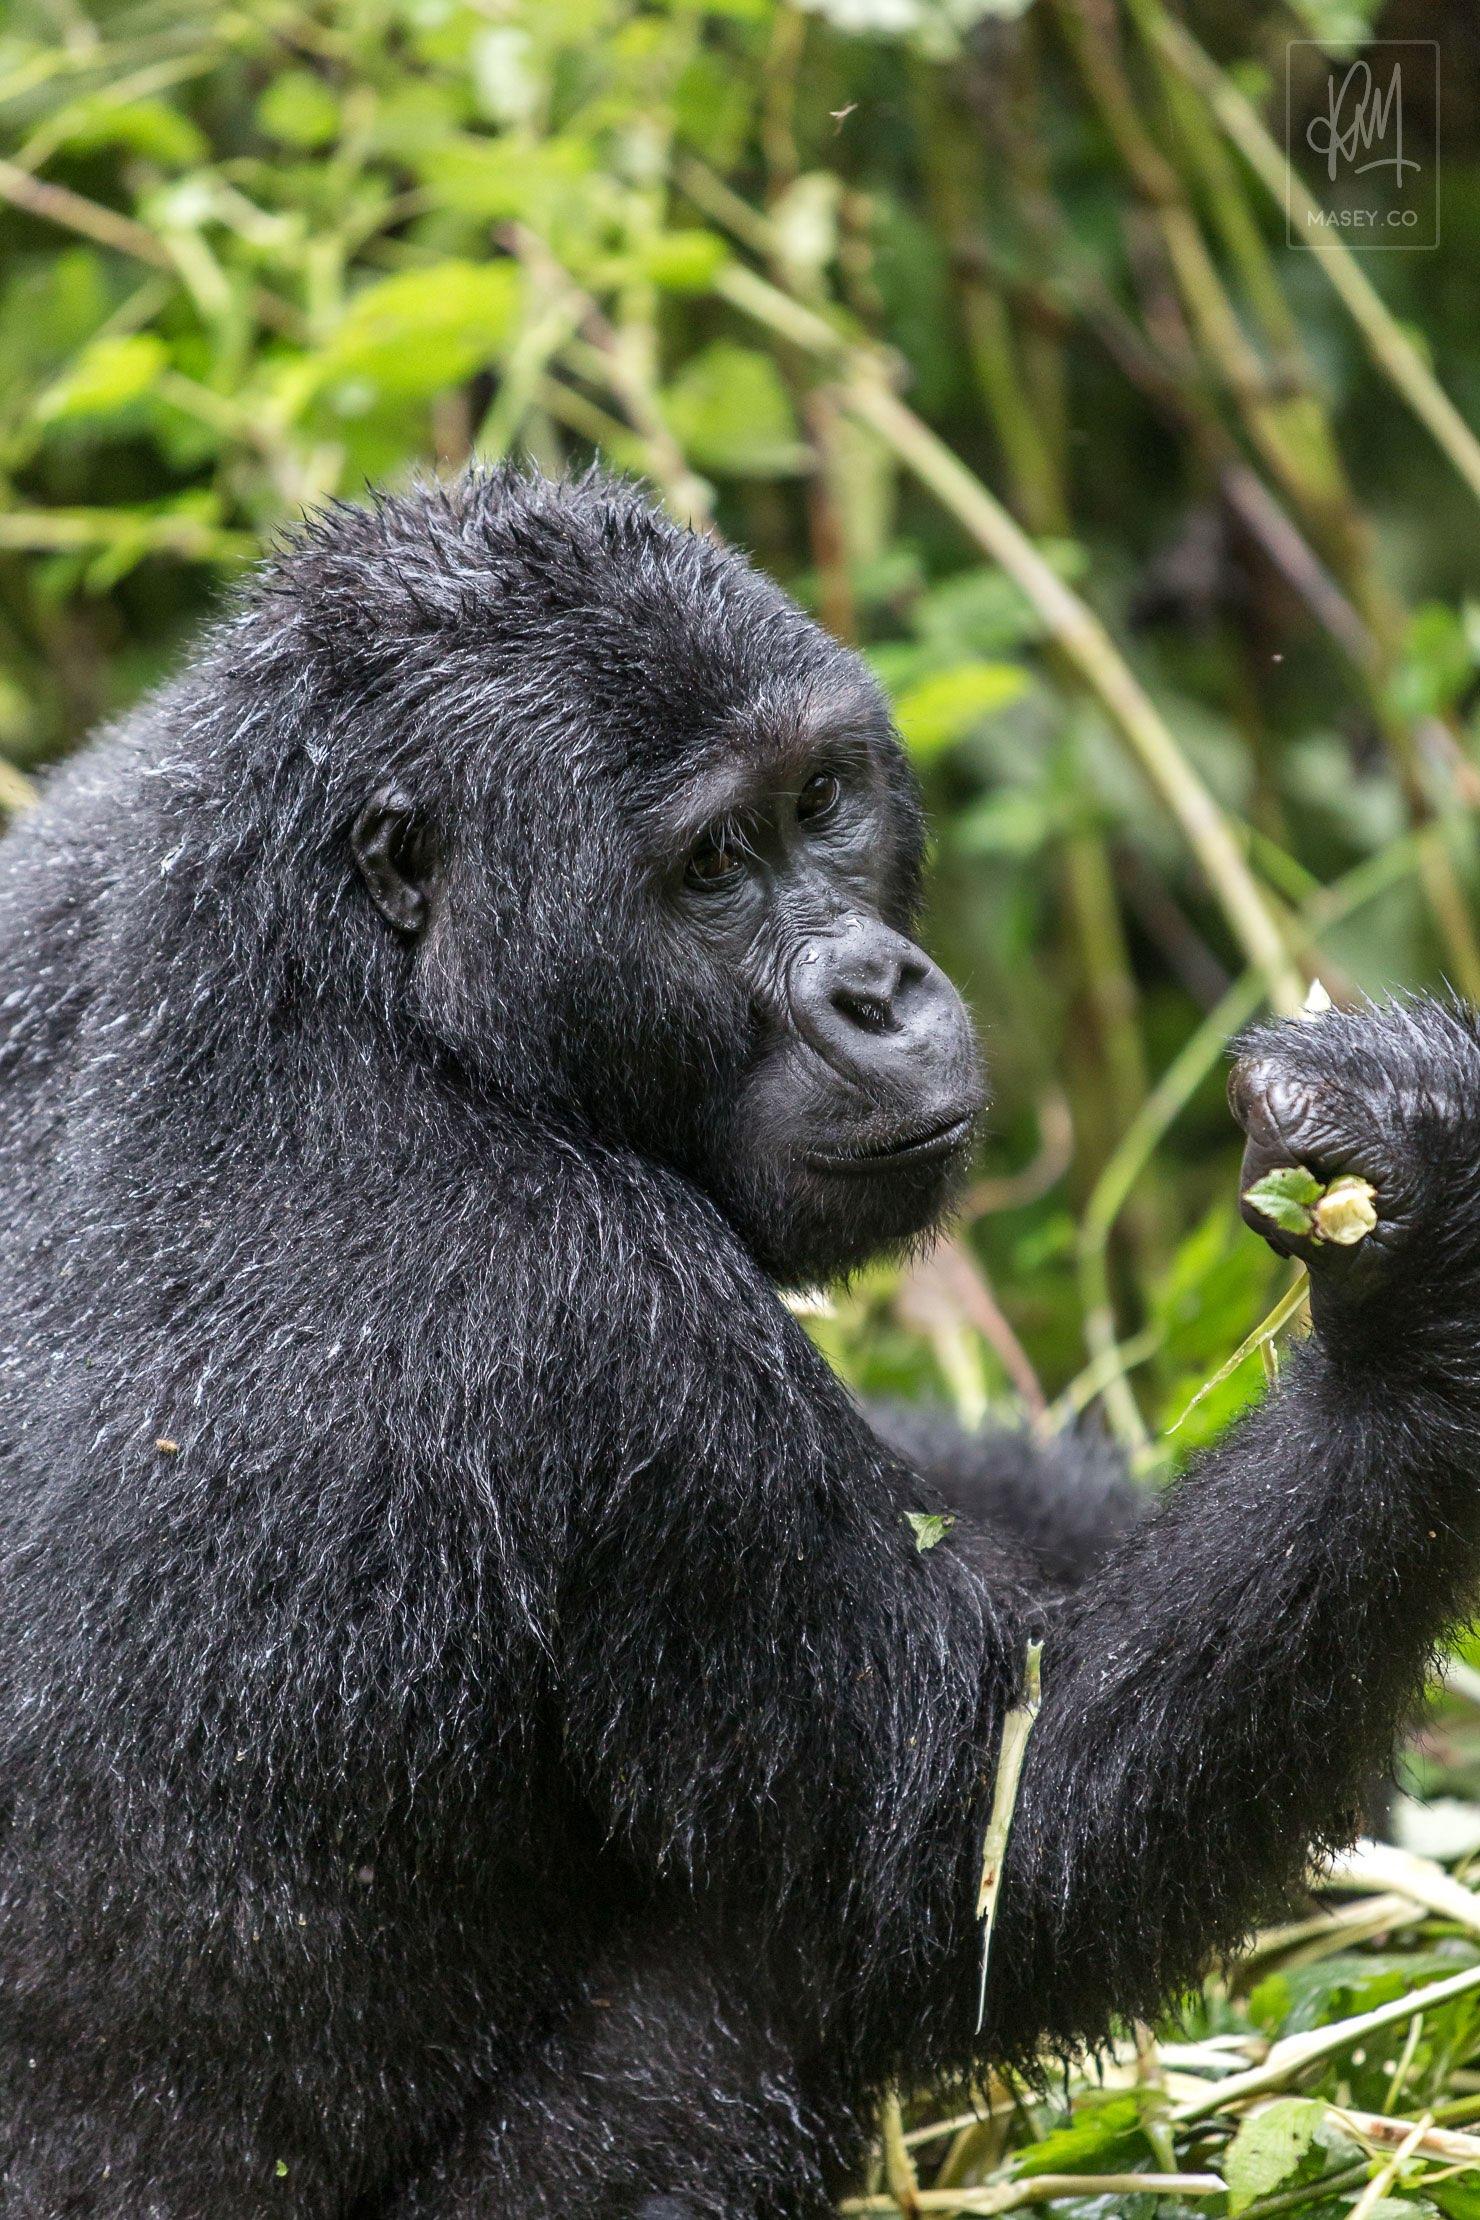 Intimidatingly handsome gorilla